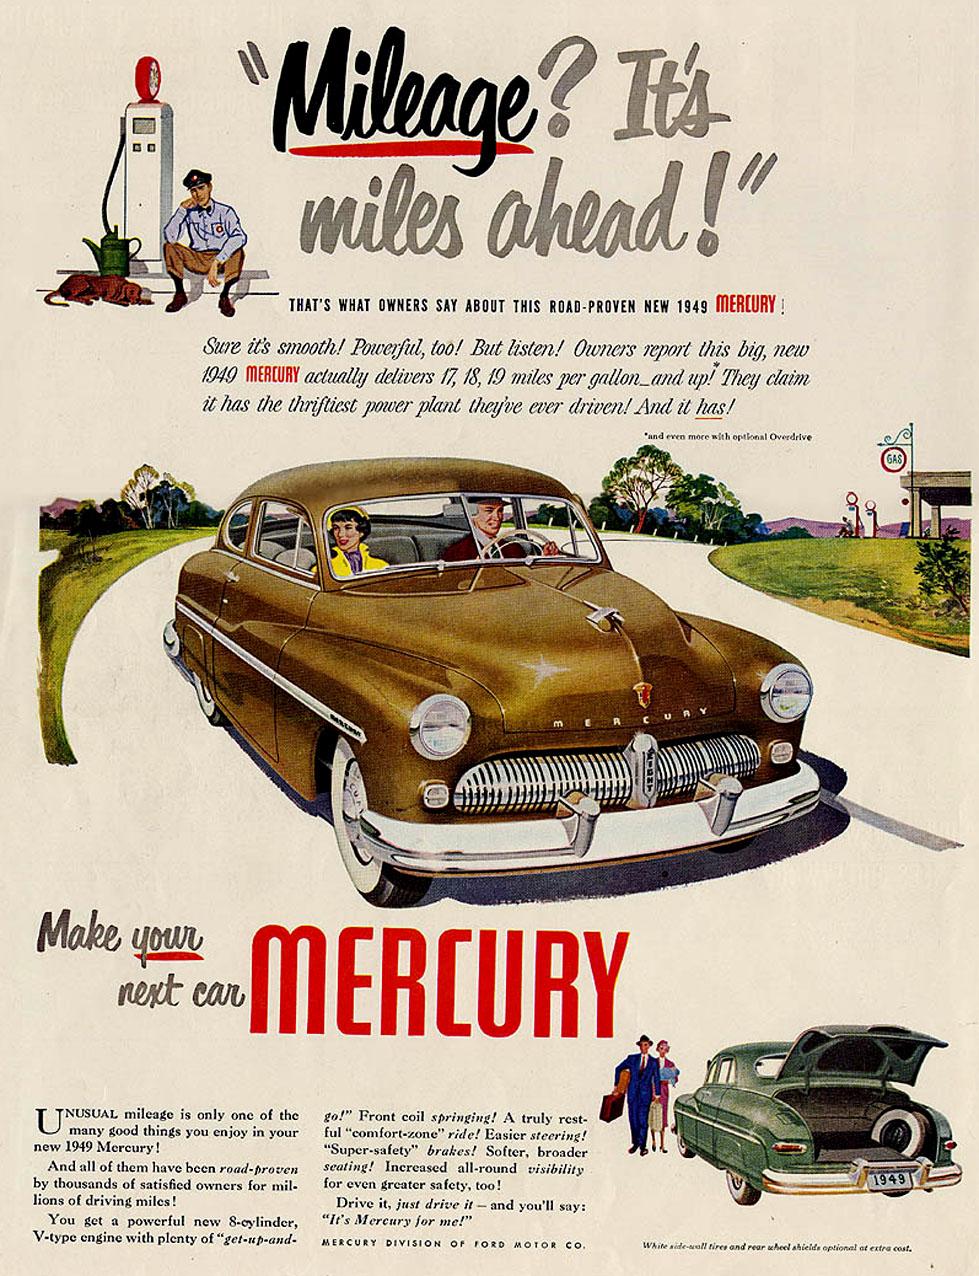 TunelRam_Mercury_1949 mileage.jpg